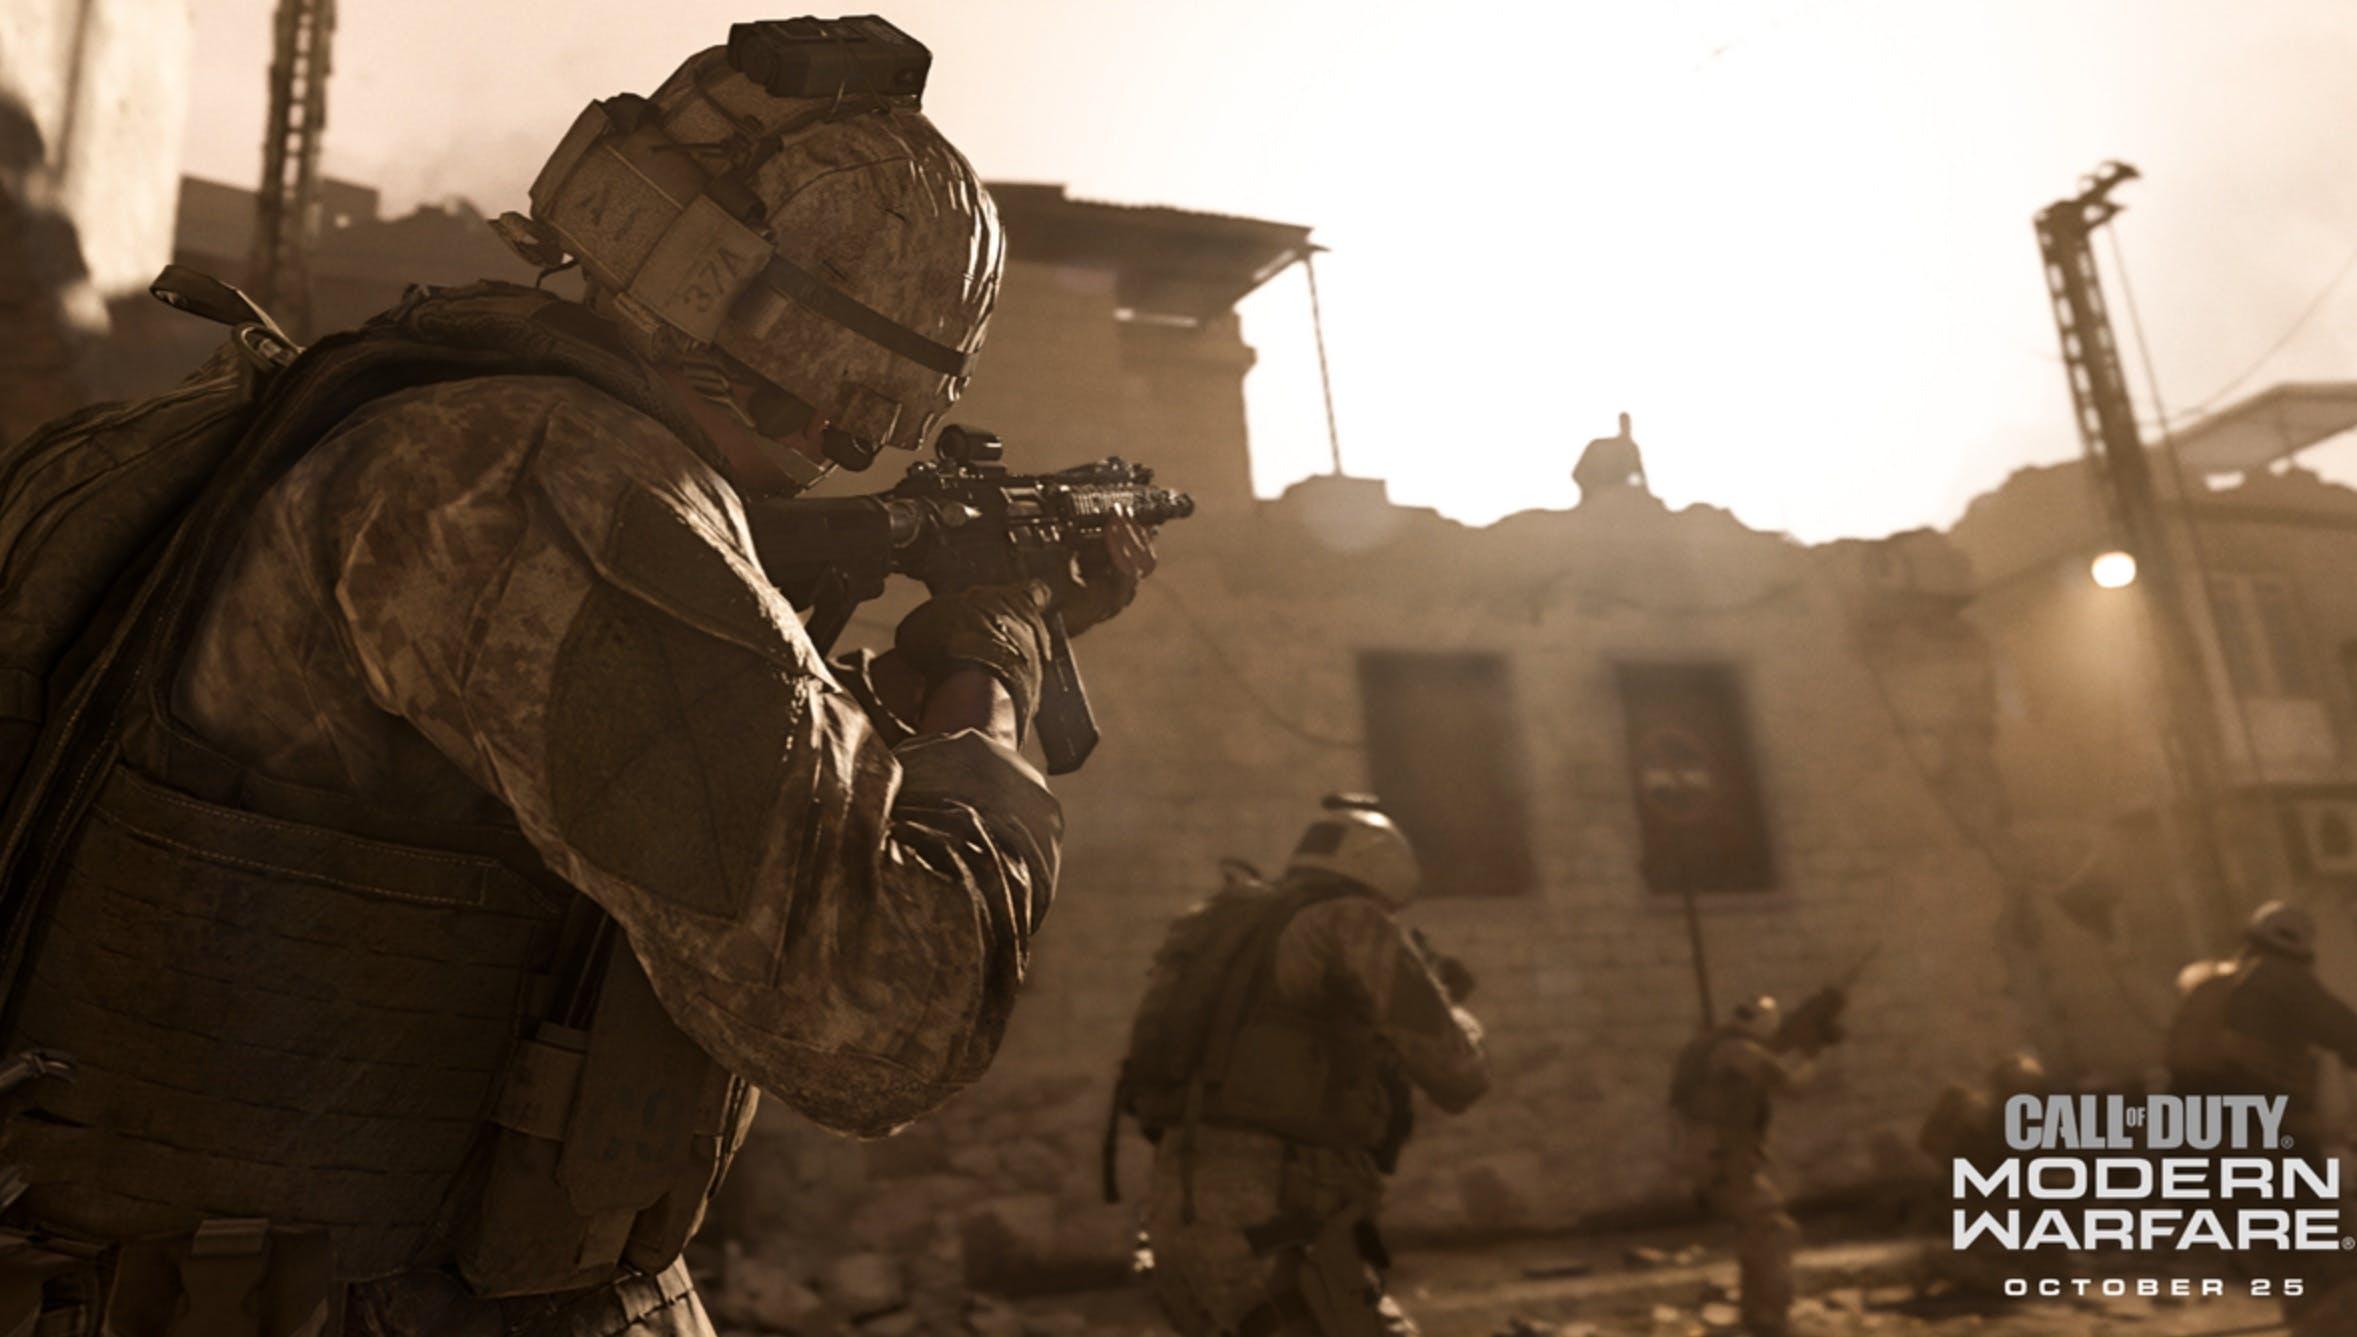 call of duty modern warfare review 3